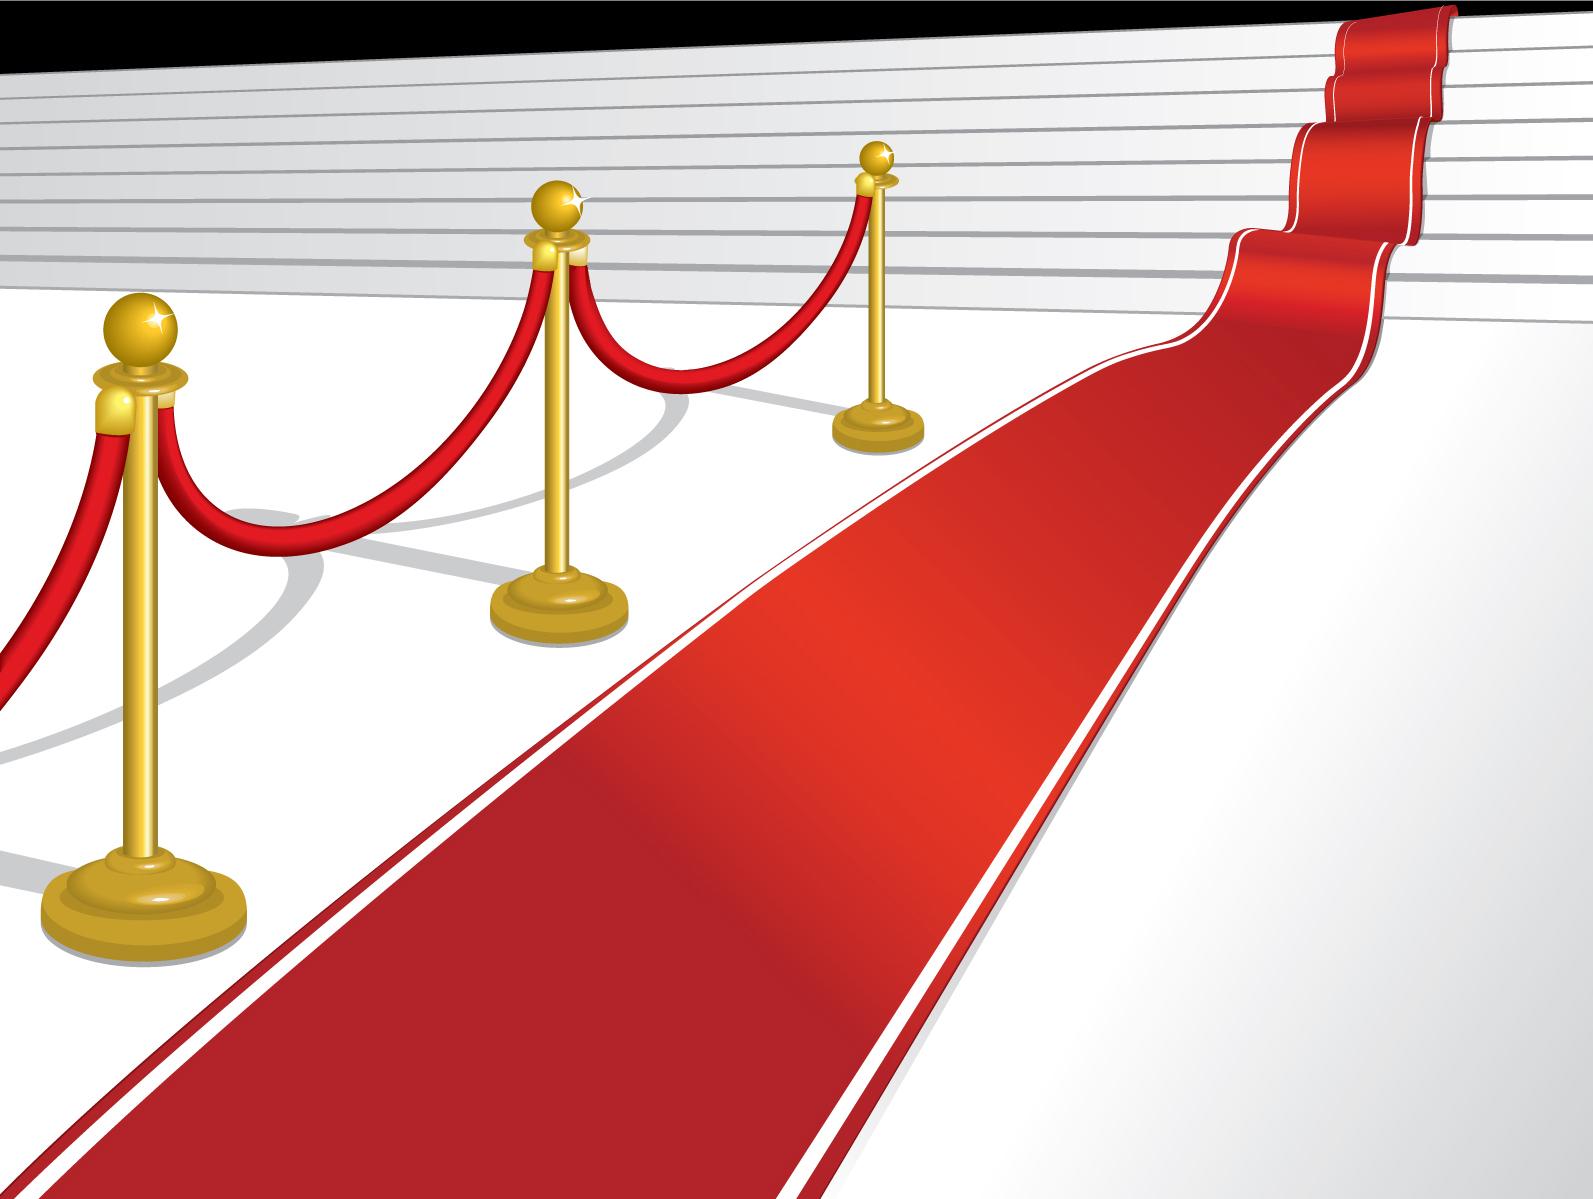 Red Carpet Wallpaper   Hd Wallpaper Background 1593x1199